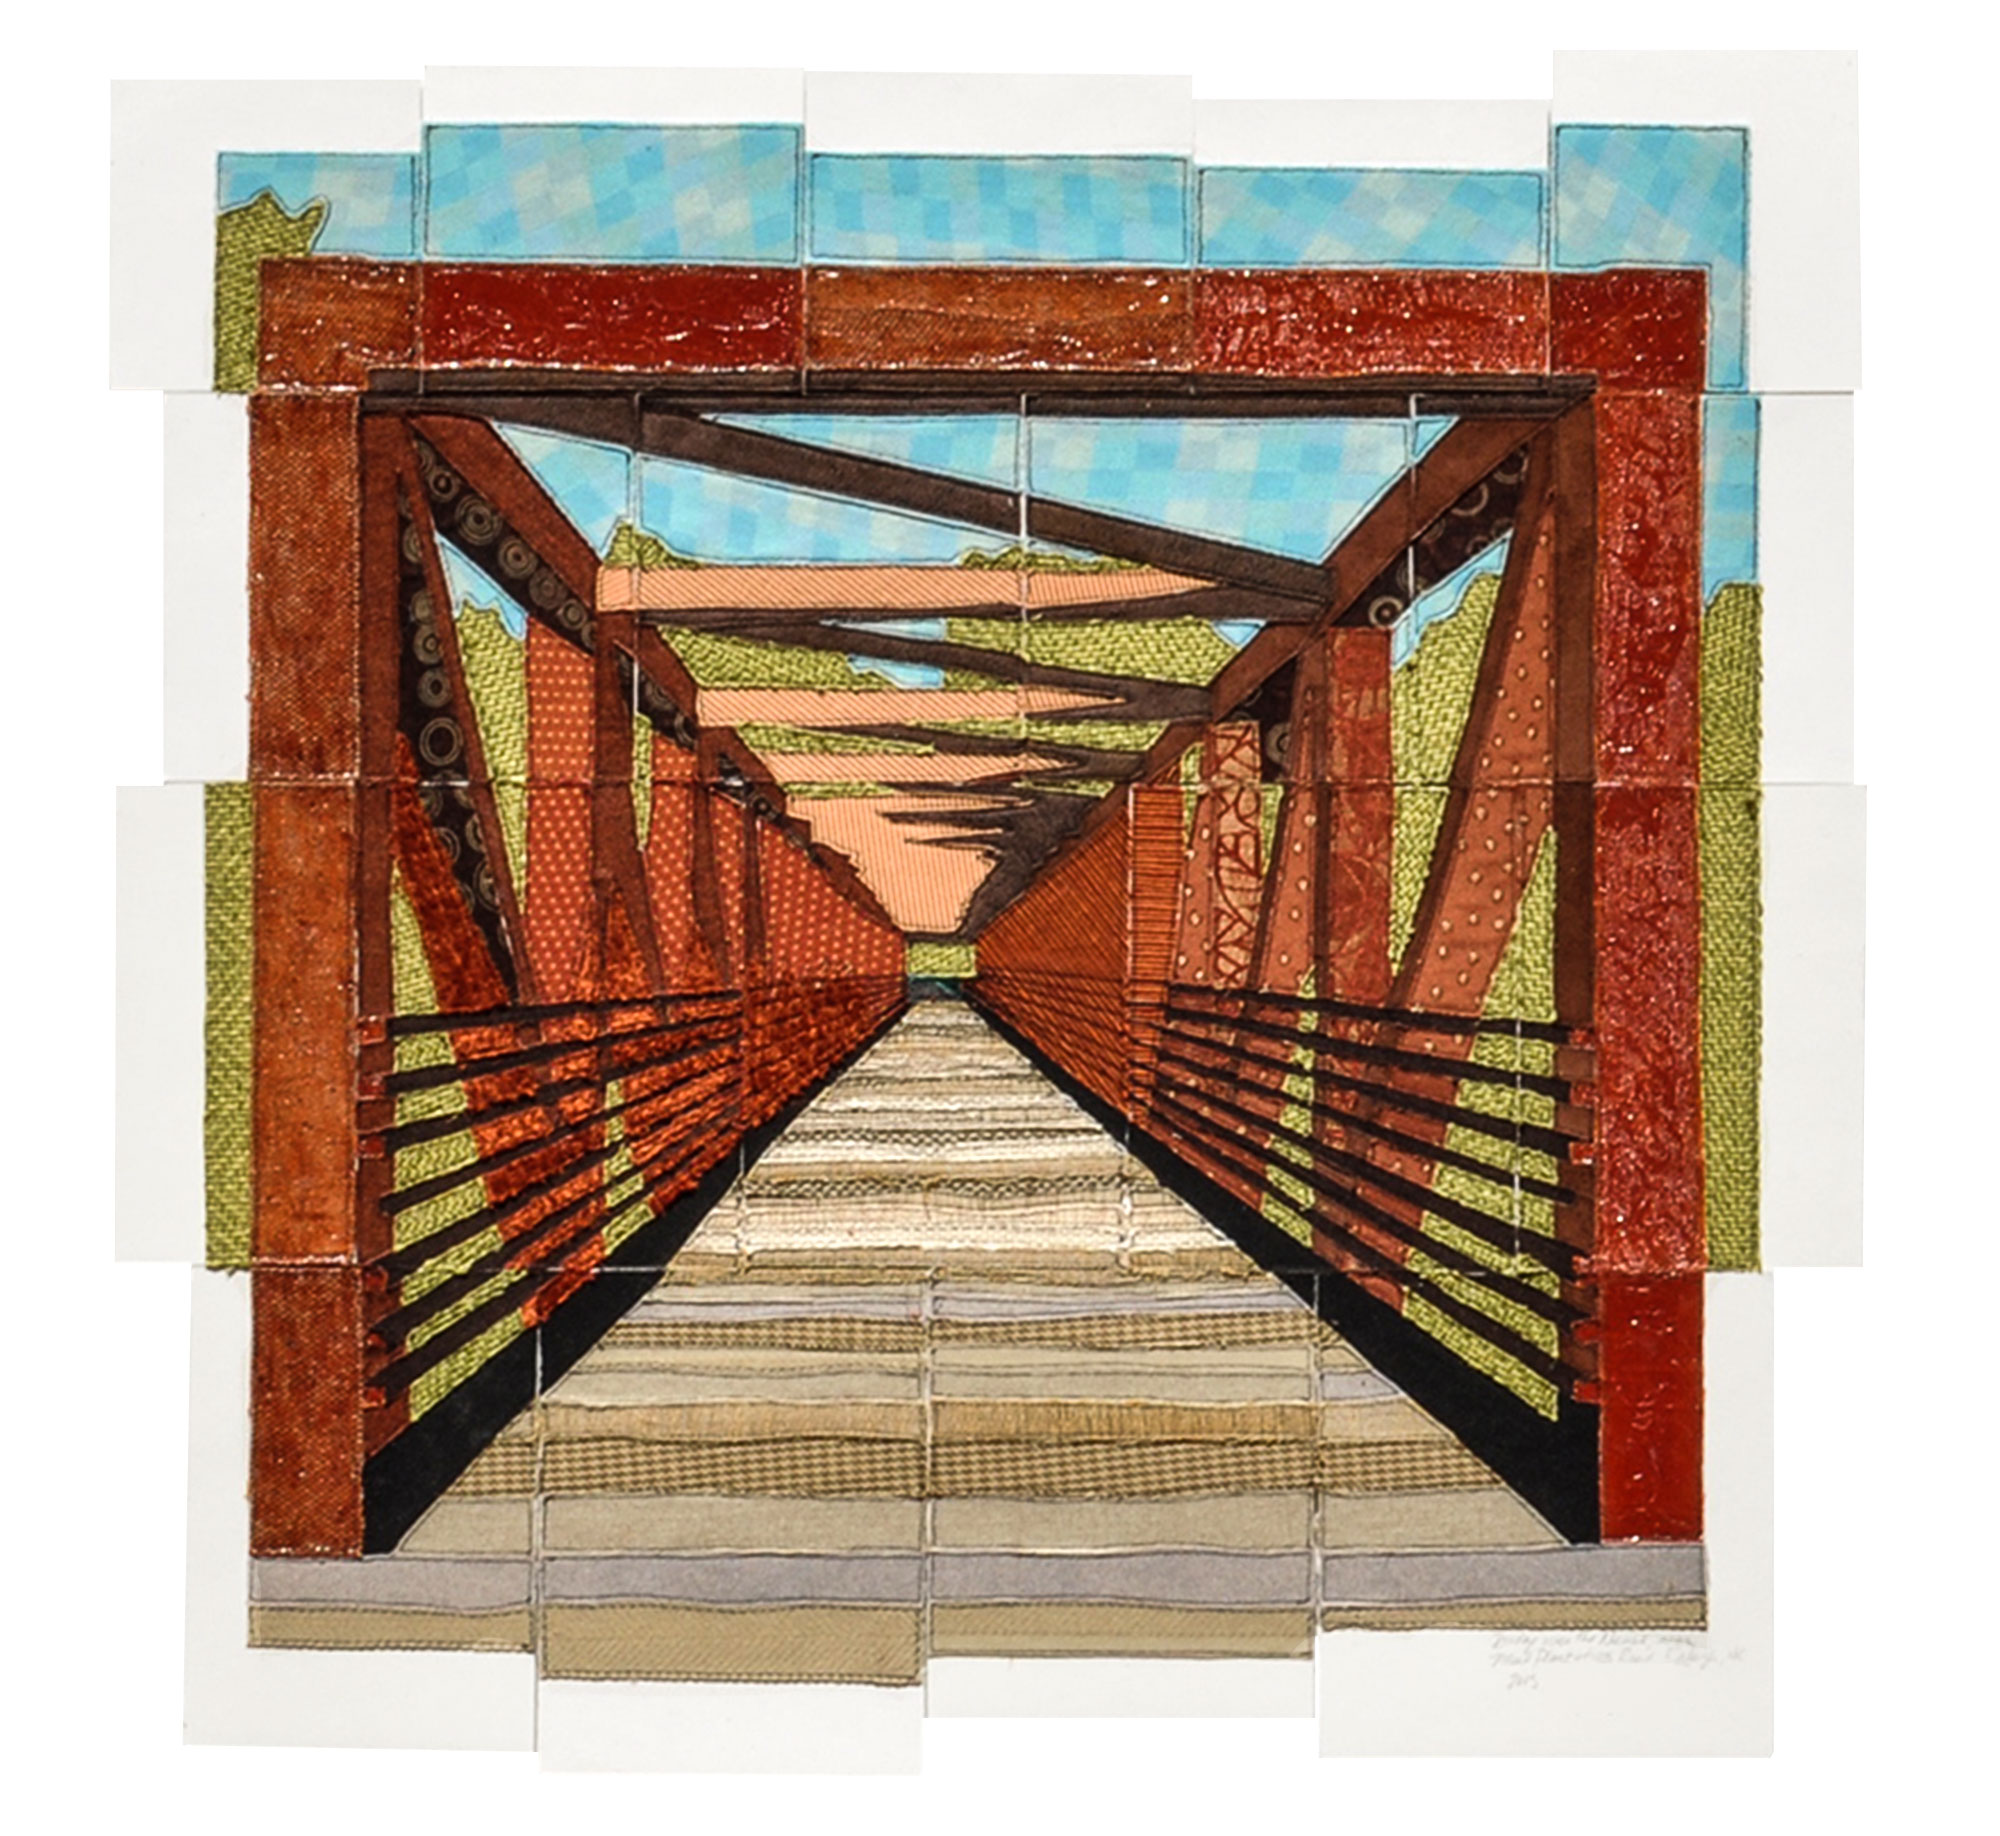 Bridge over the Neuse near Mial Plantation Rd., Raleigh, NC, 2015